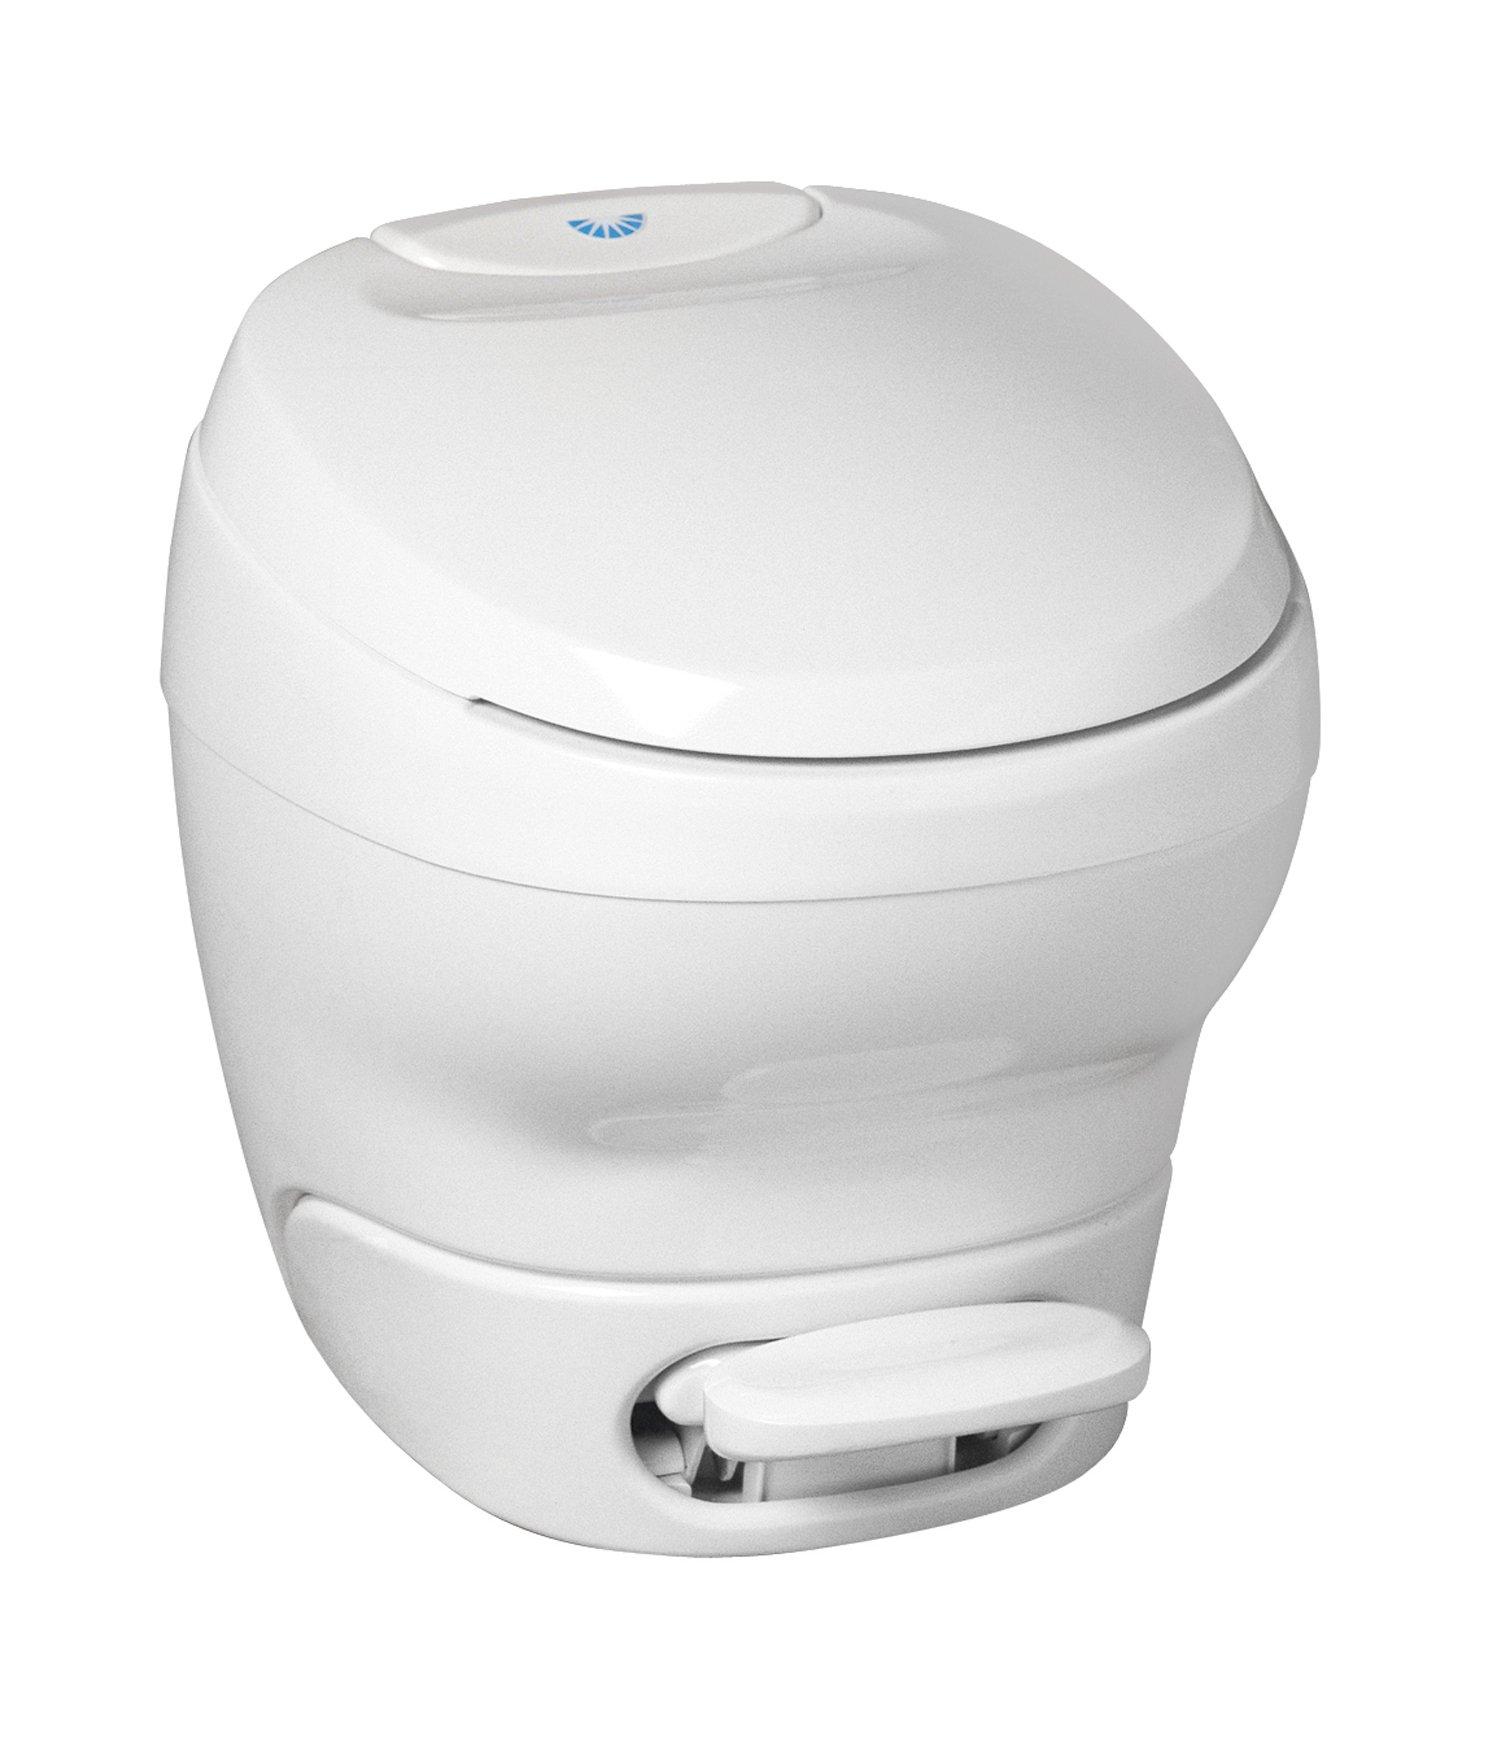 Thetford White Aqua Magic Bravura RV Toilet-High Profile Color 31084 by Thetford